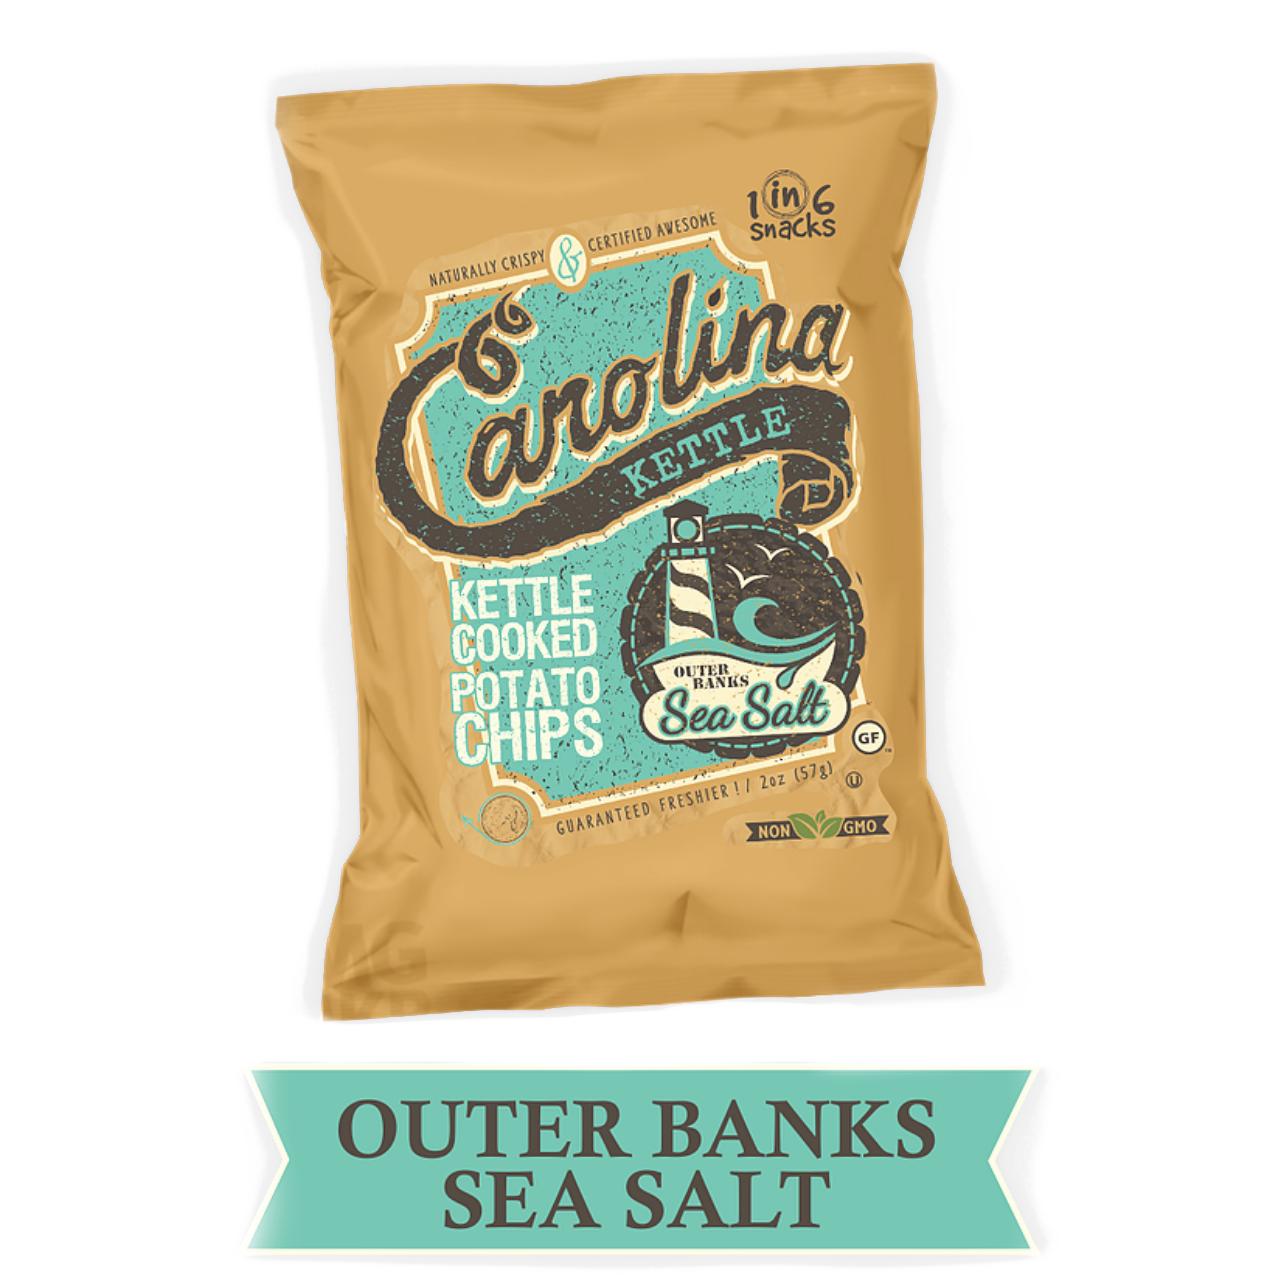 Carolina Kettle Outer Banks Sea Salt Potato Chips, 2oz